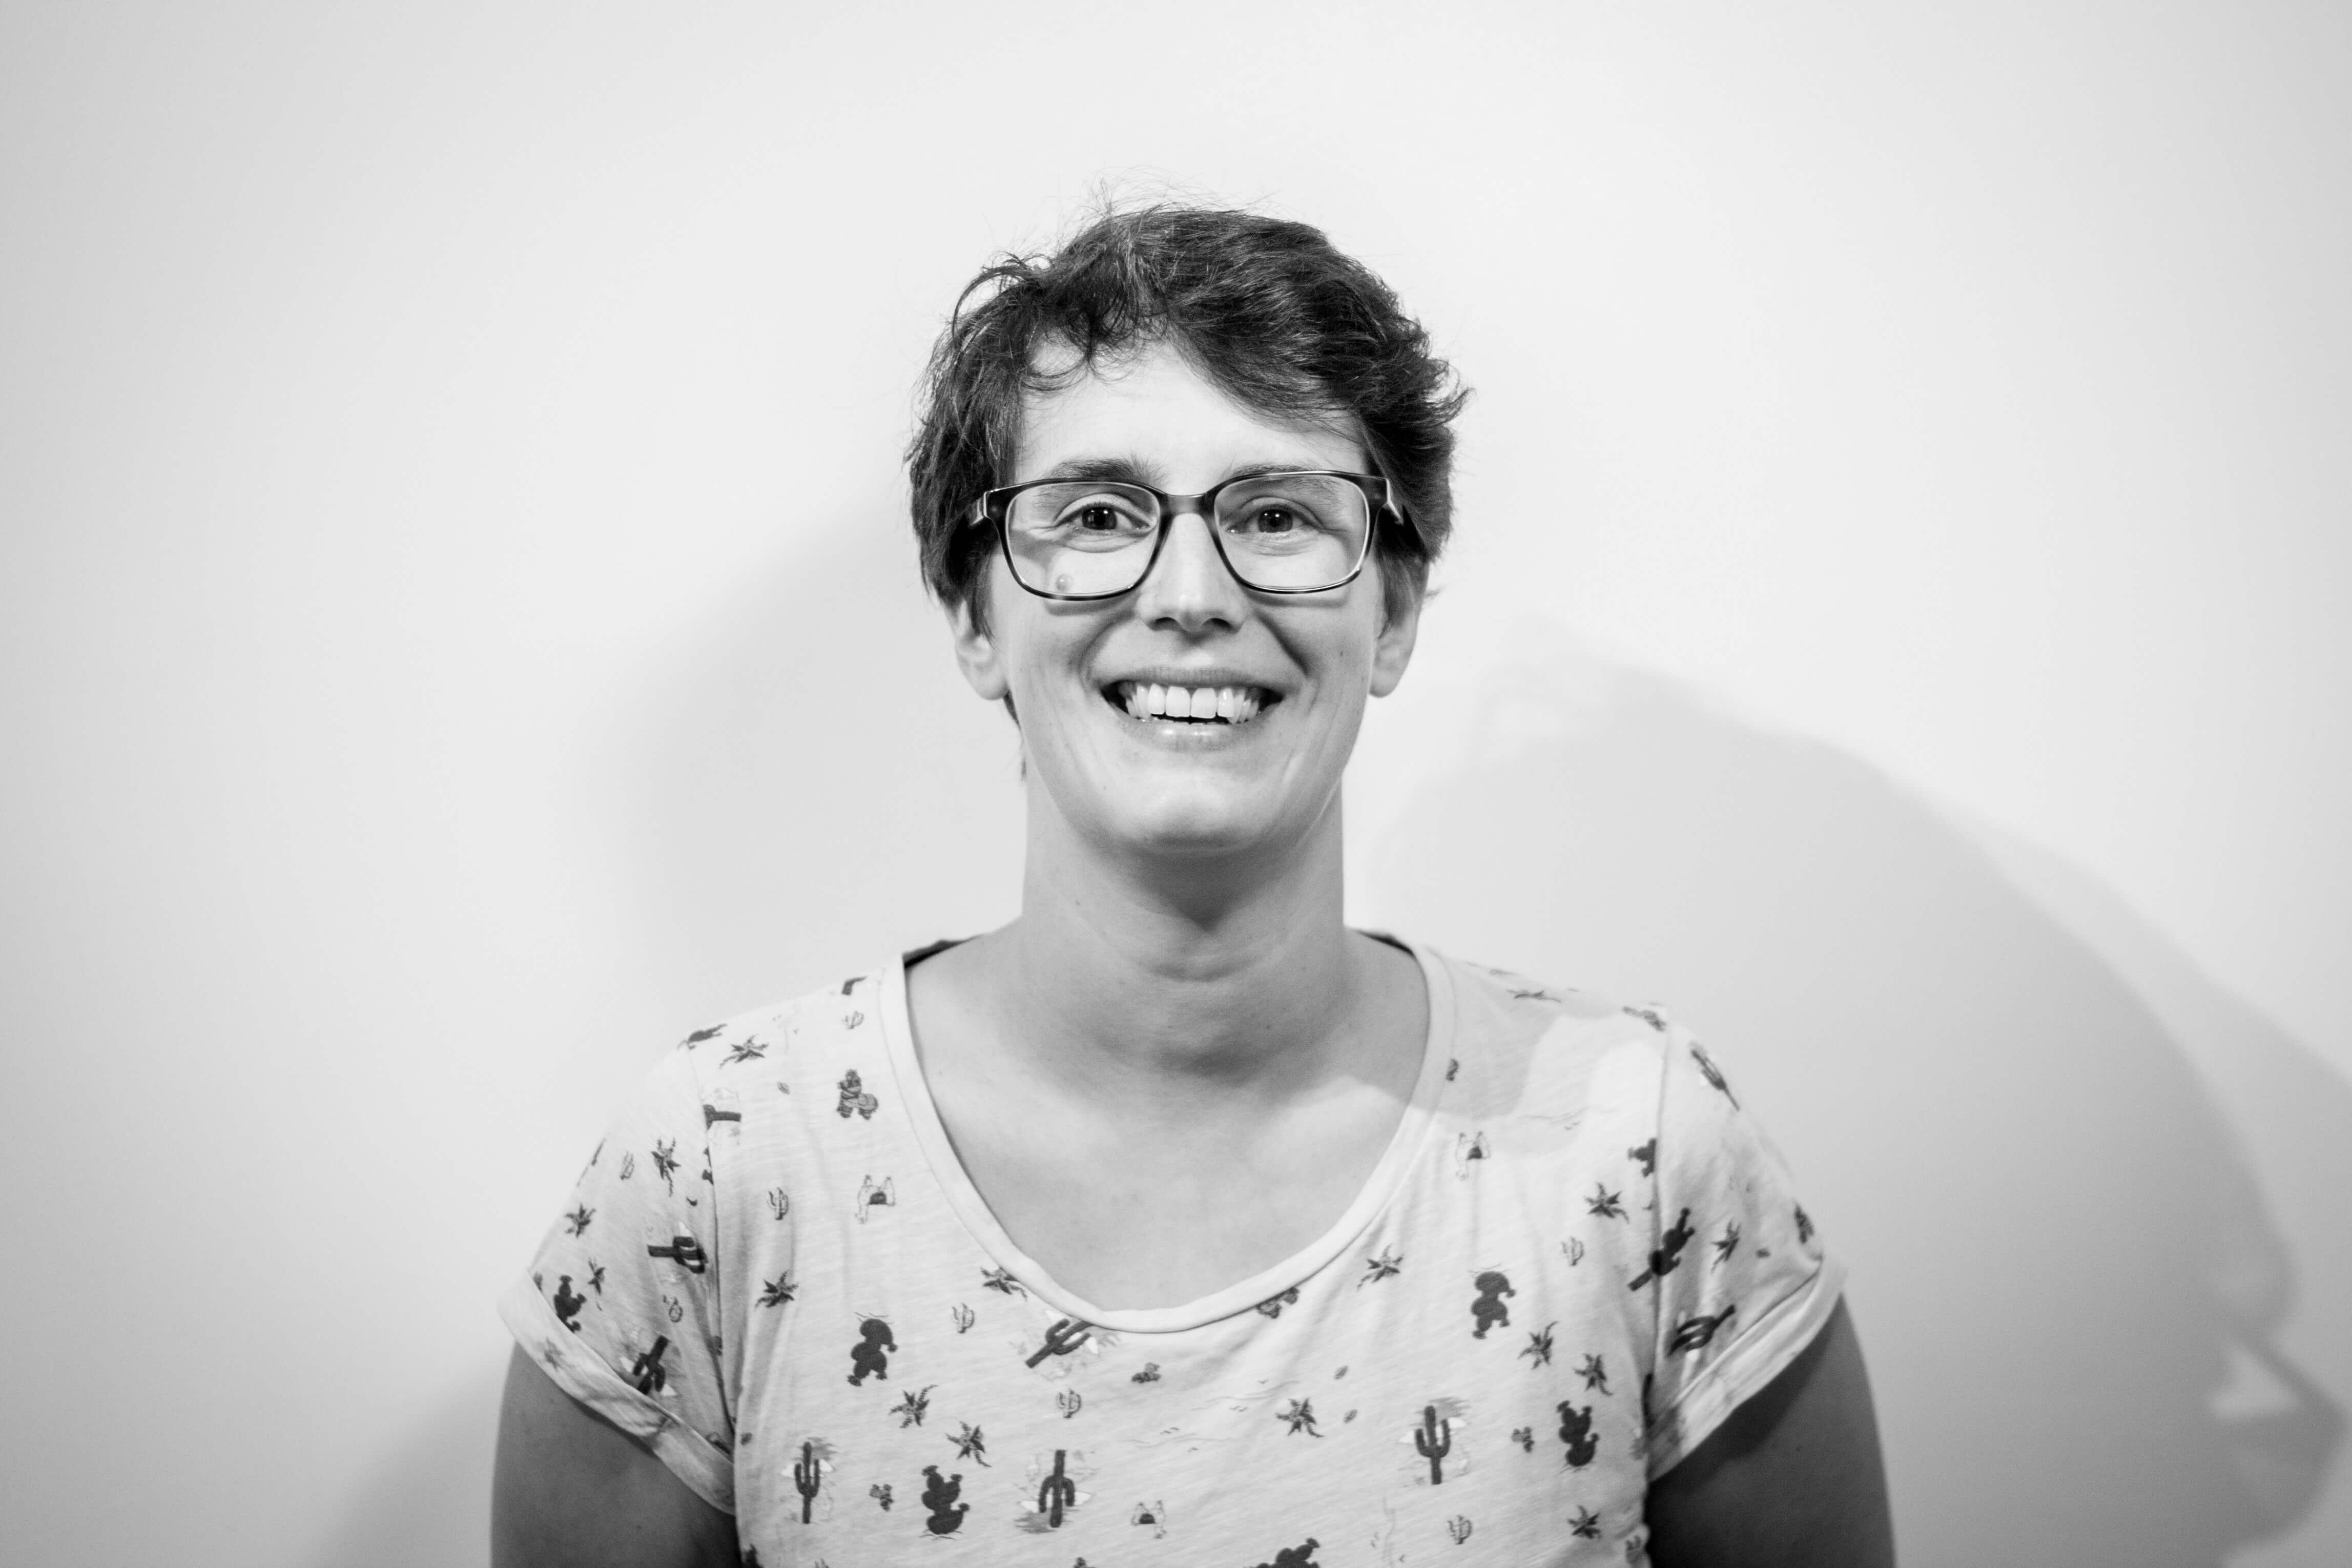 Sarah Soenen